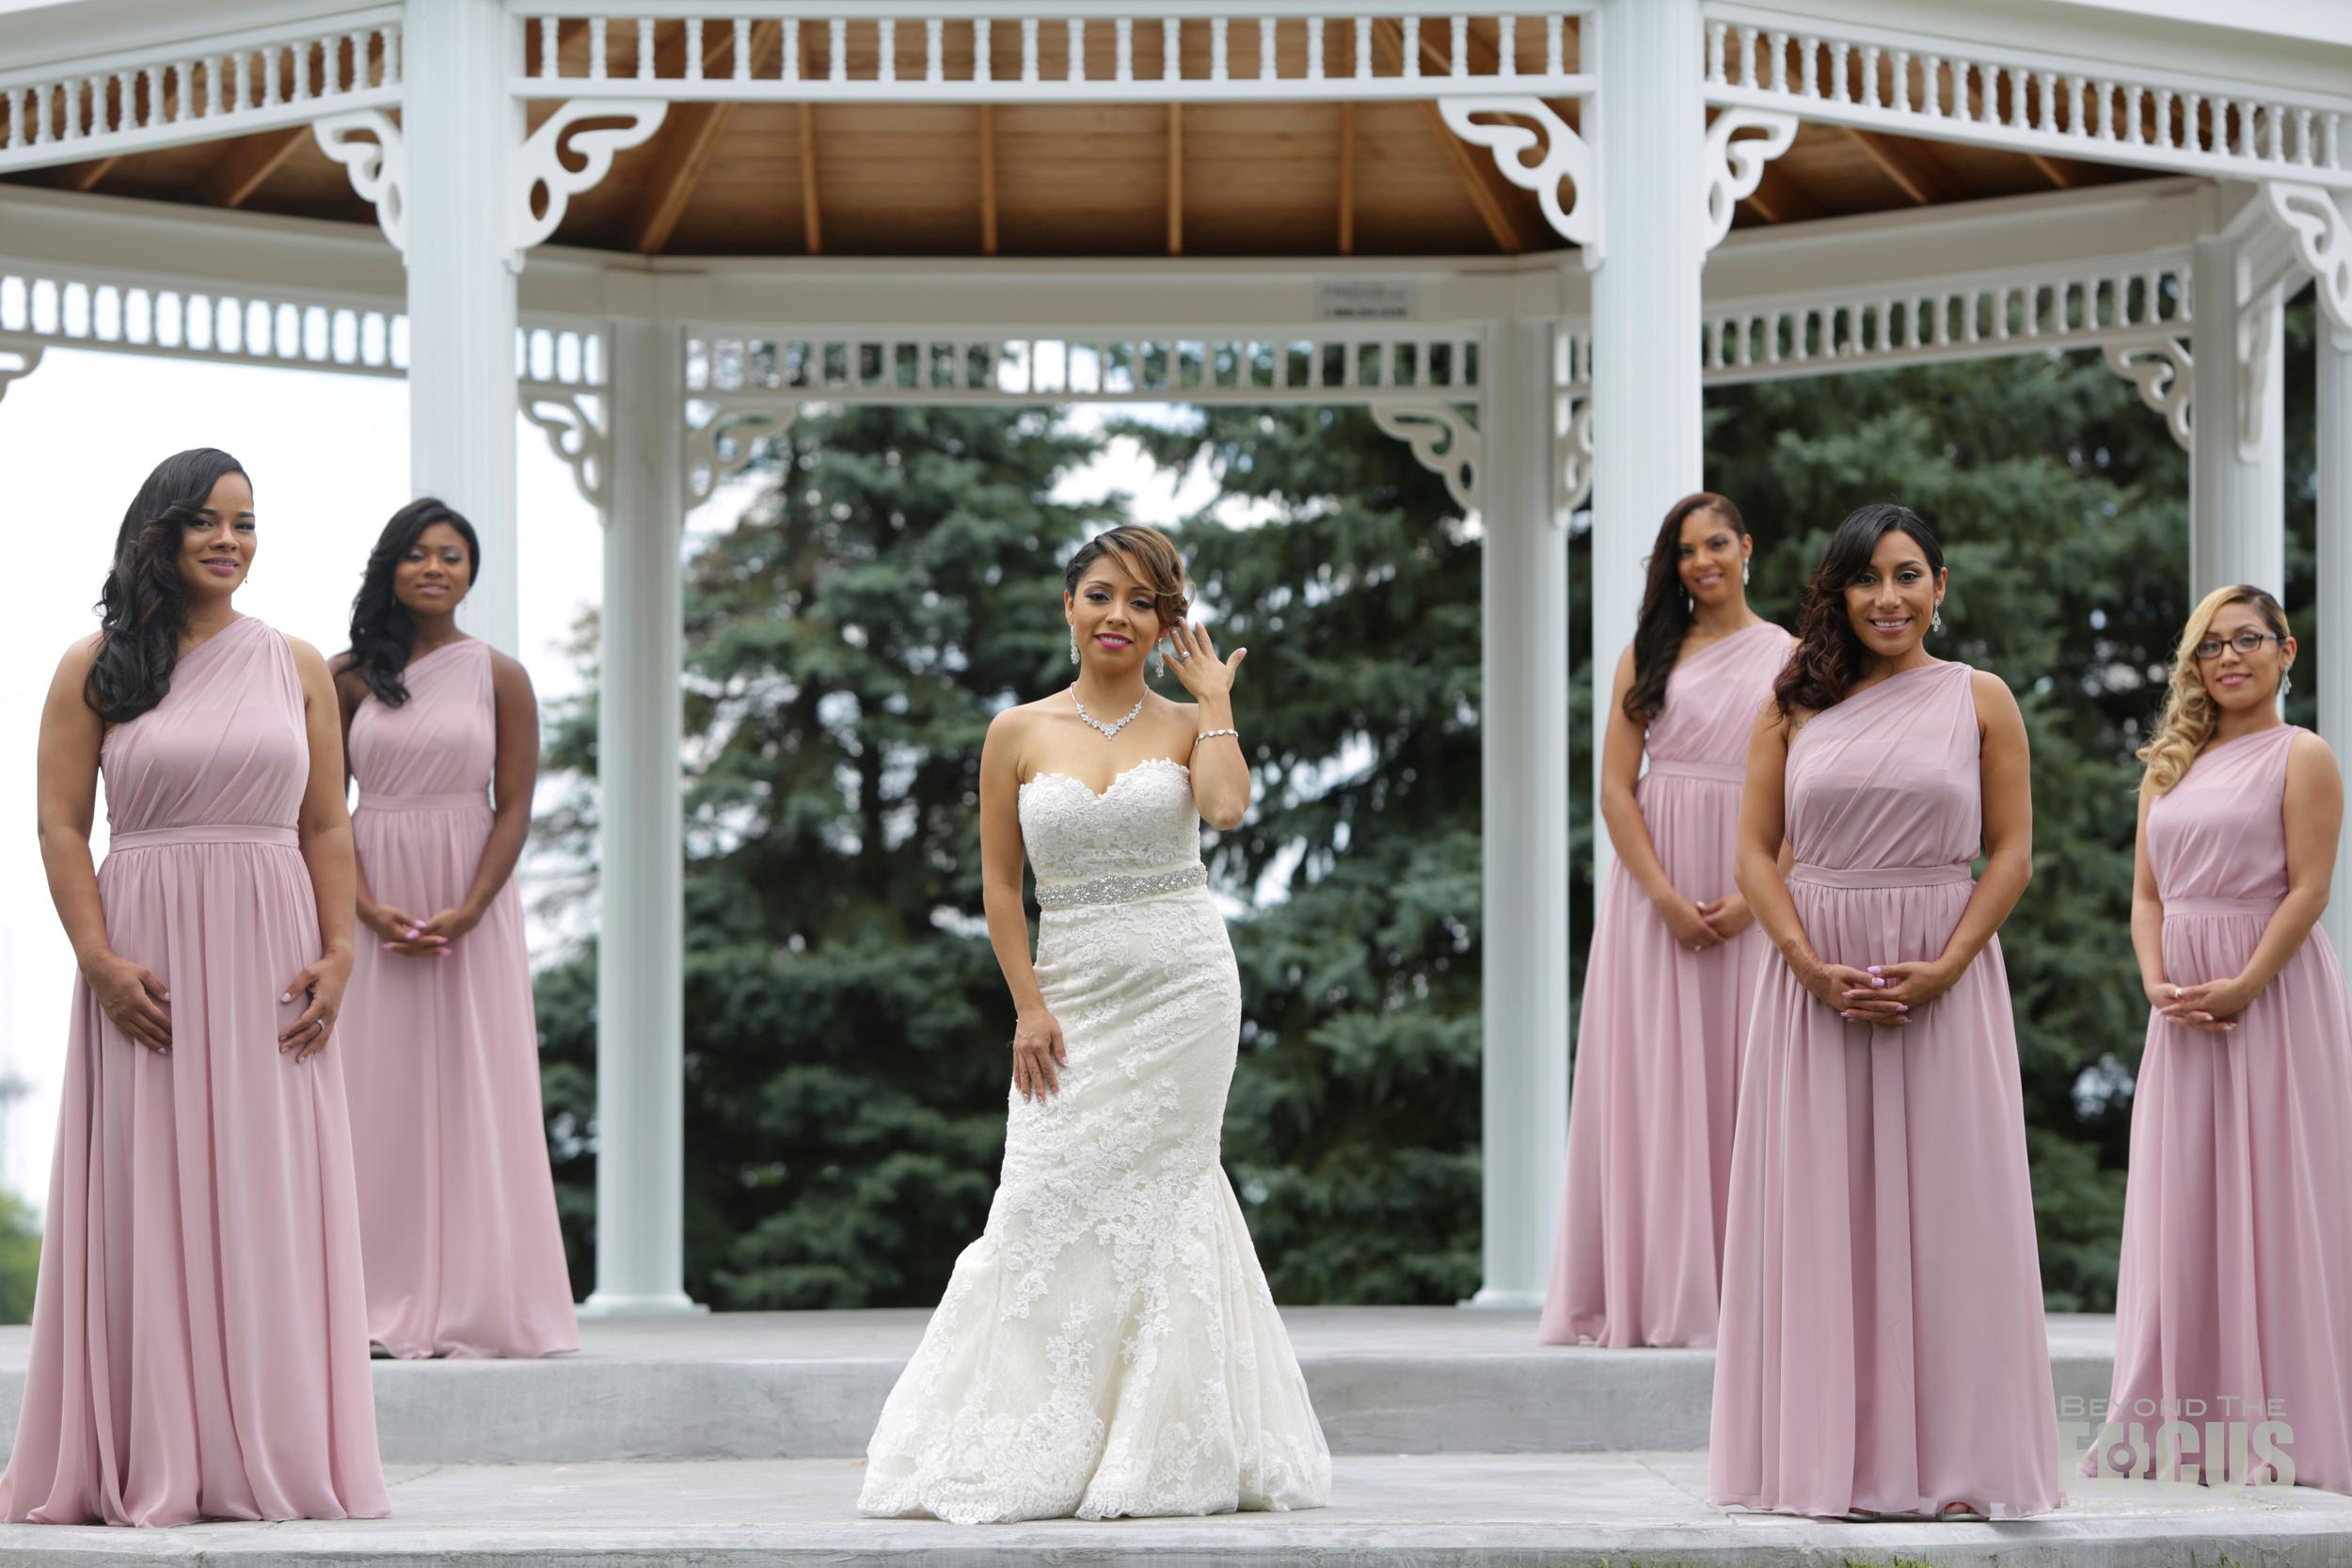 Palmer Wedding - Pre-Wedding Photos 14.jpg